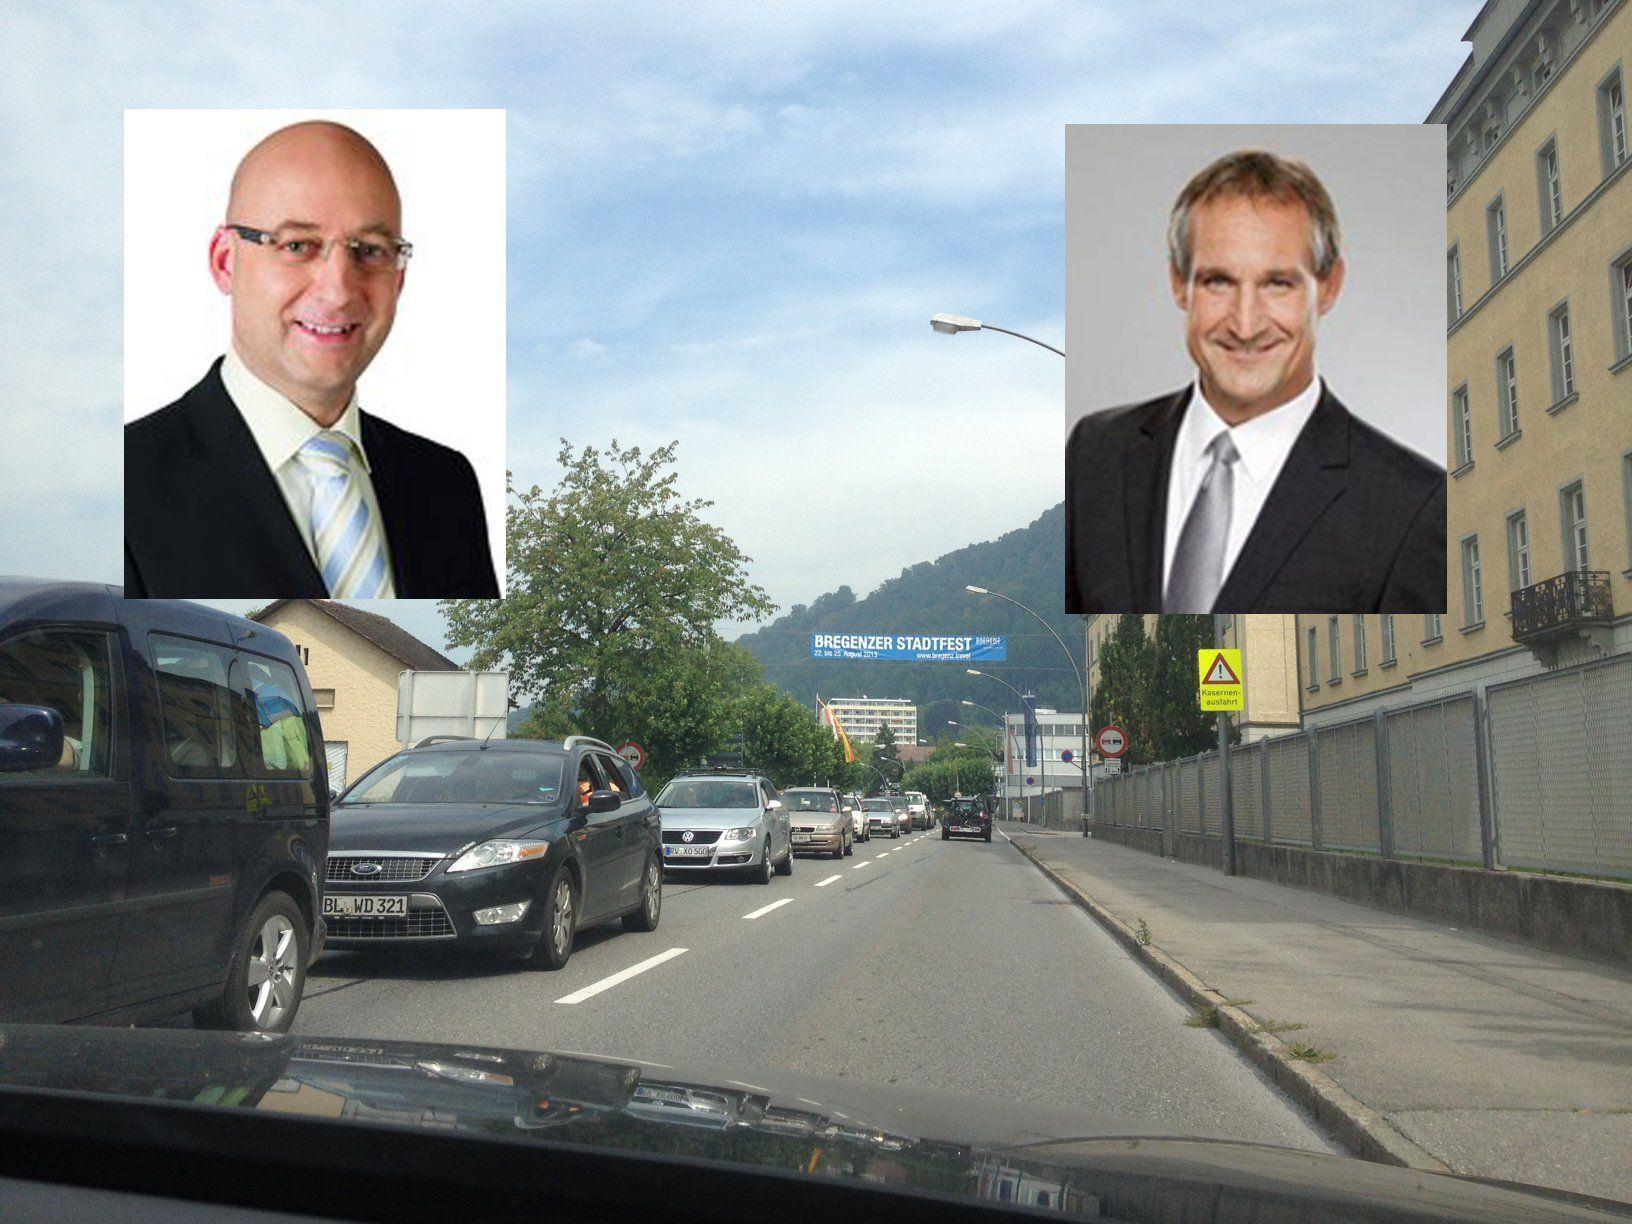 Verkehrschaos in Bregenz: Linhart lehnt Verantwortung ab, SPÖ will Wiedereinführug der Korridorvignette